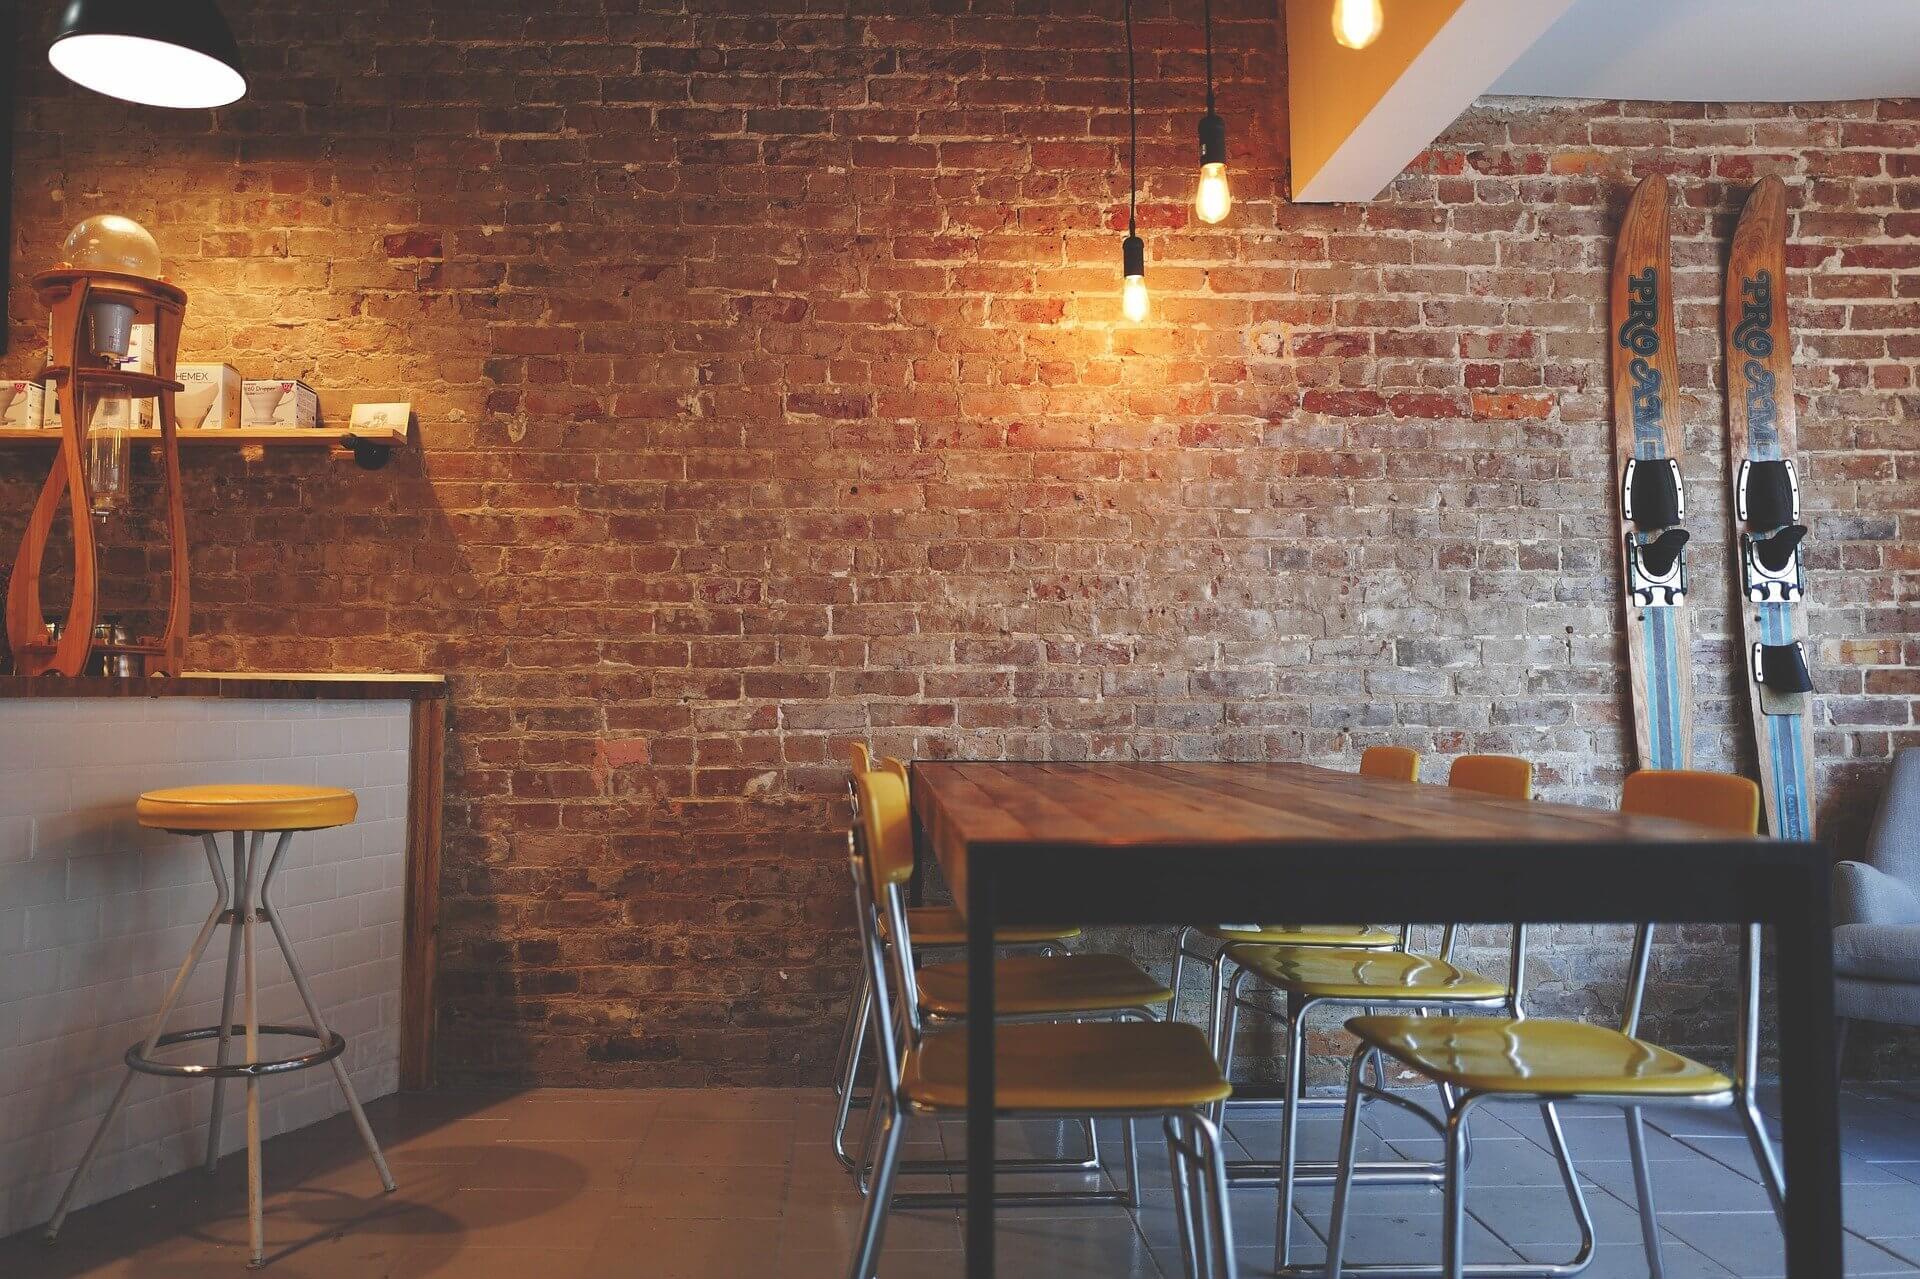 nando's restaurant-gallery